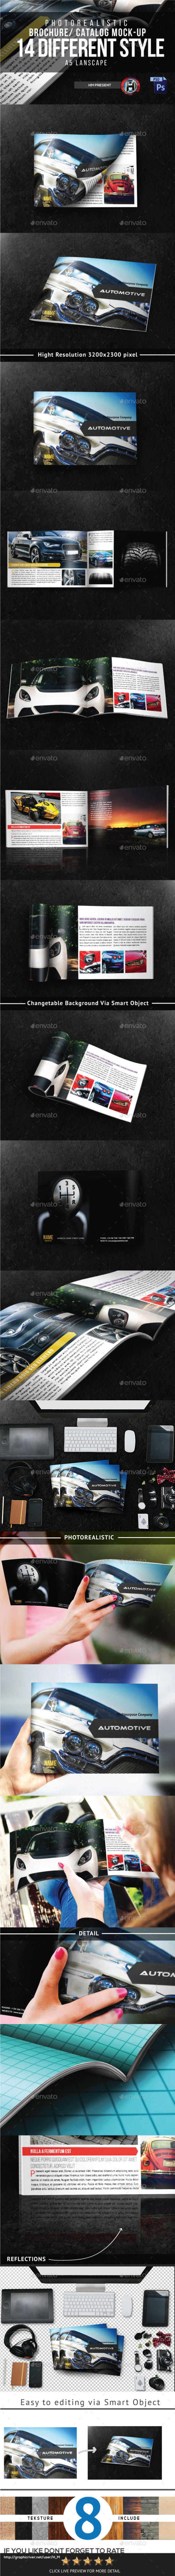 14 lanscape Brochure Mock-Ups - Brochures Print